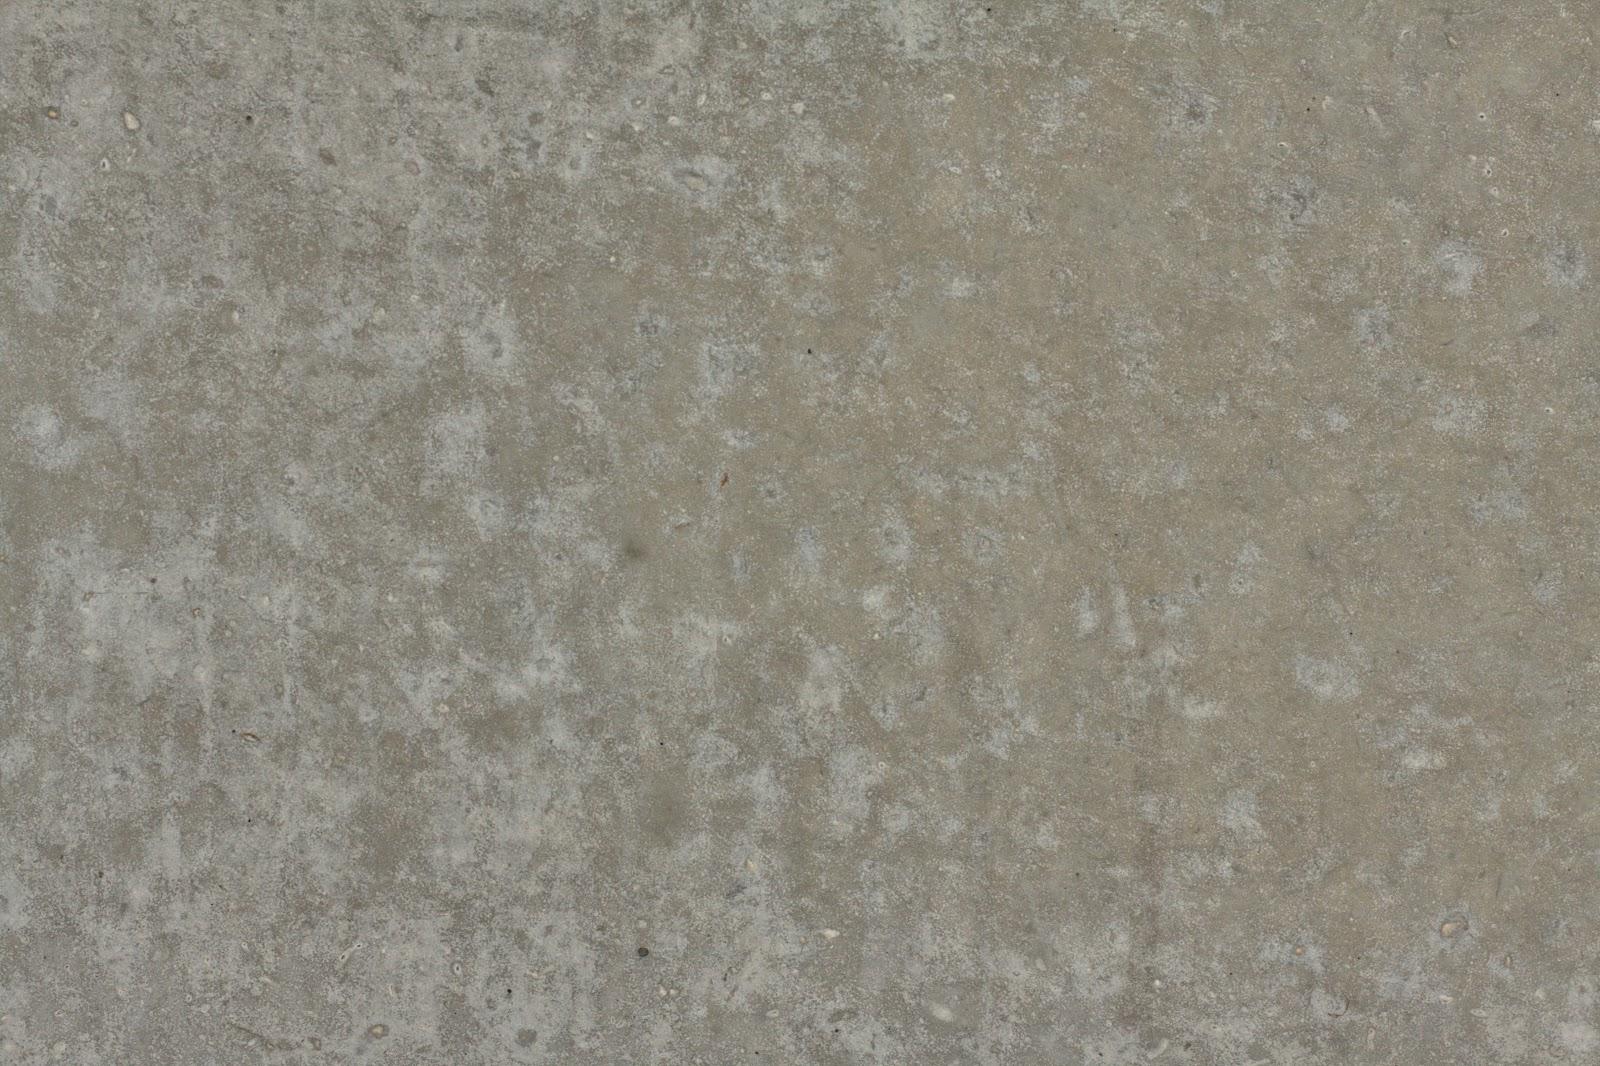 (CONCRETE 25) granite wall grunge pillar texture 4770x3178